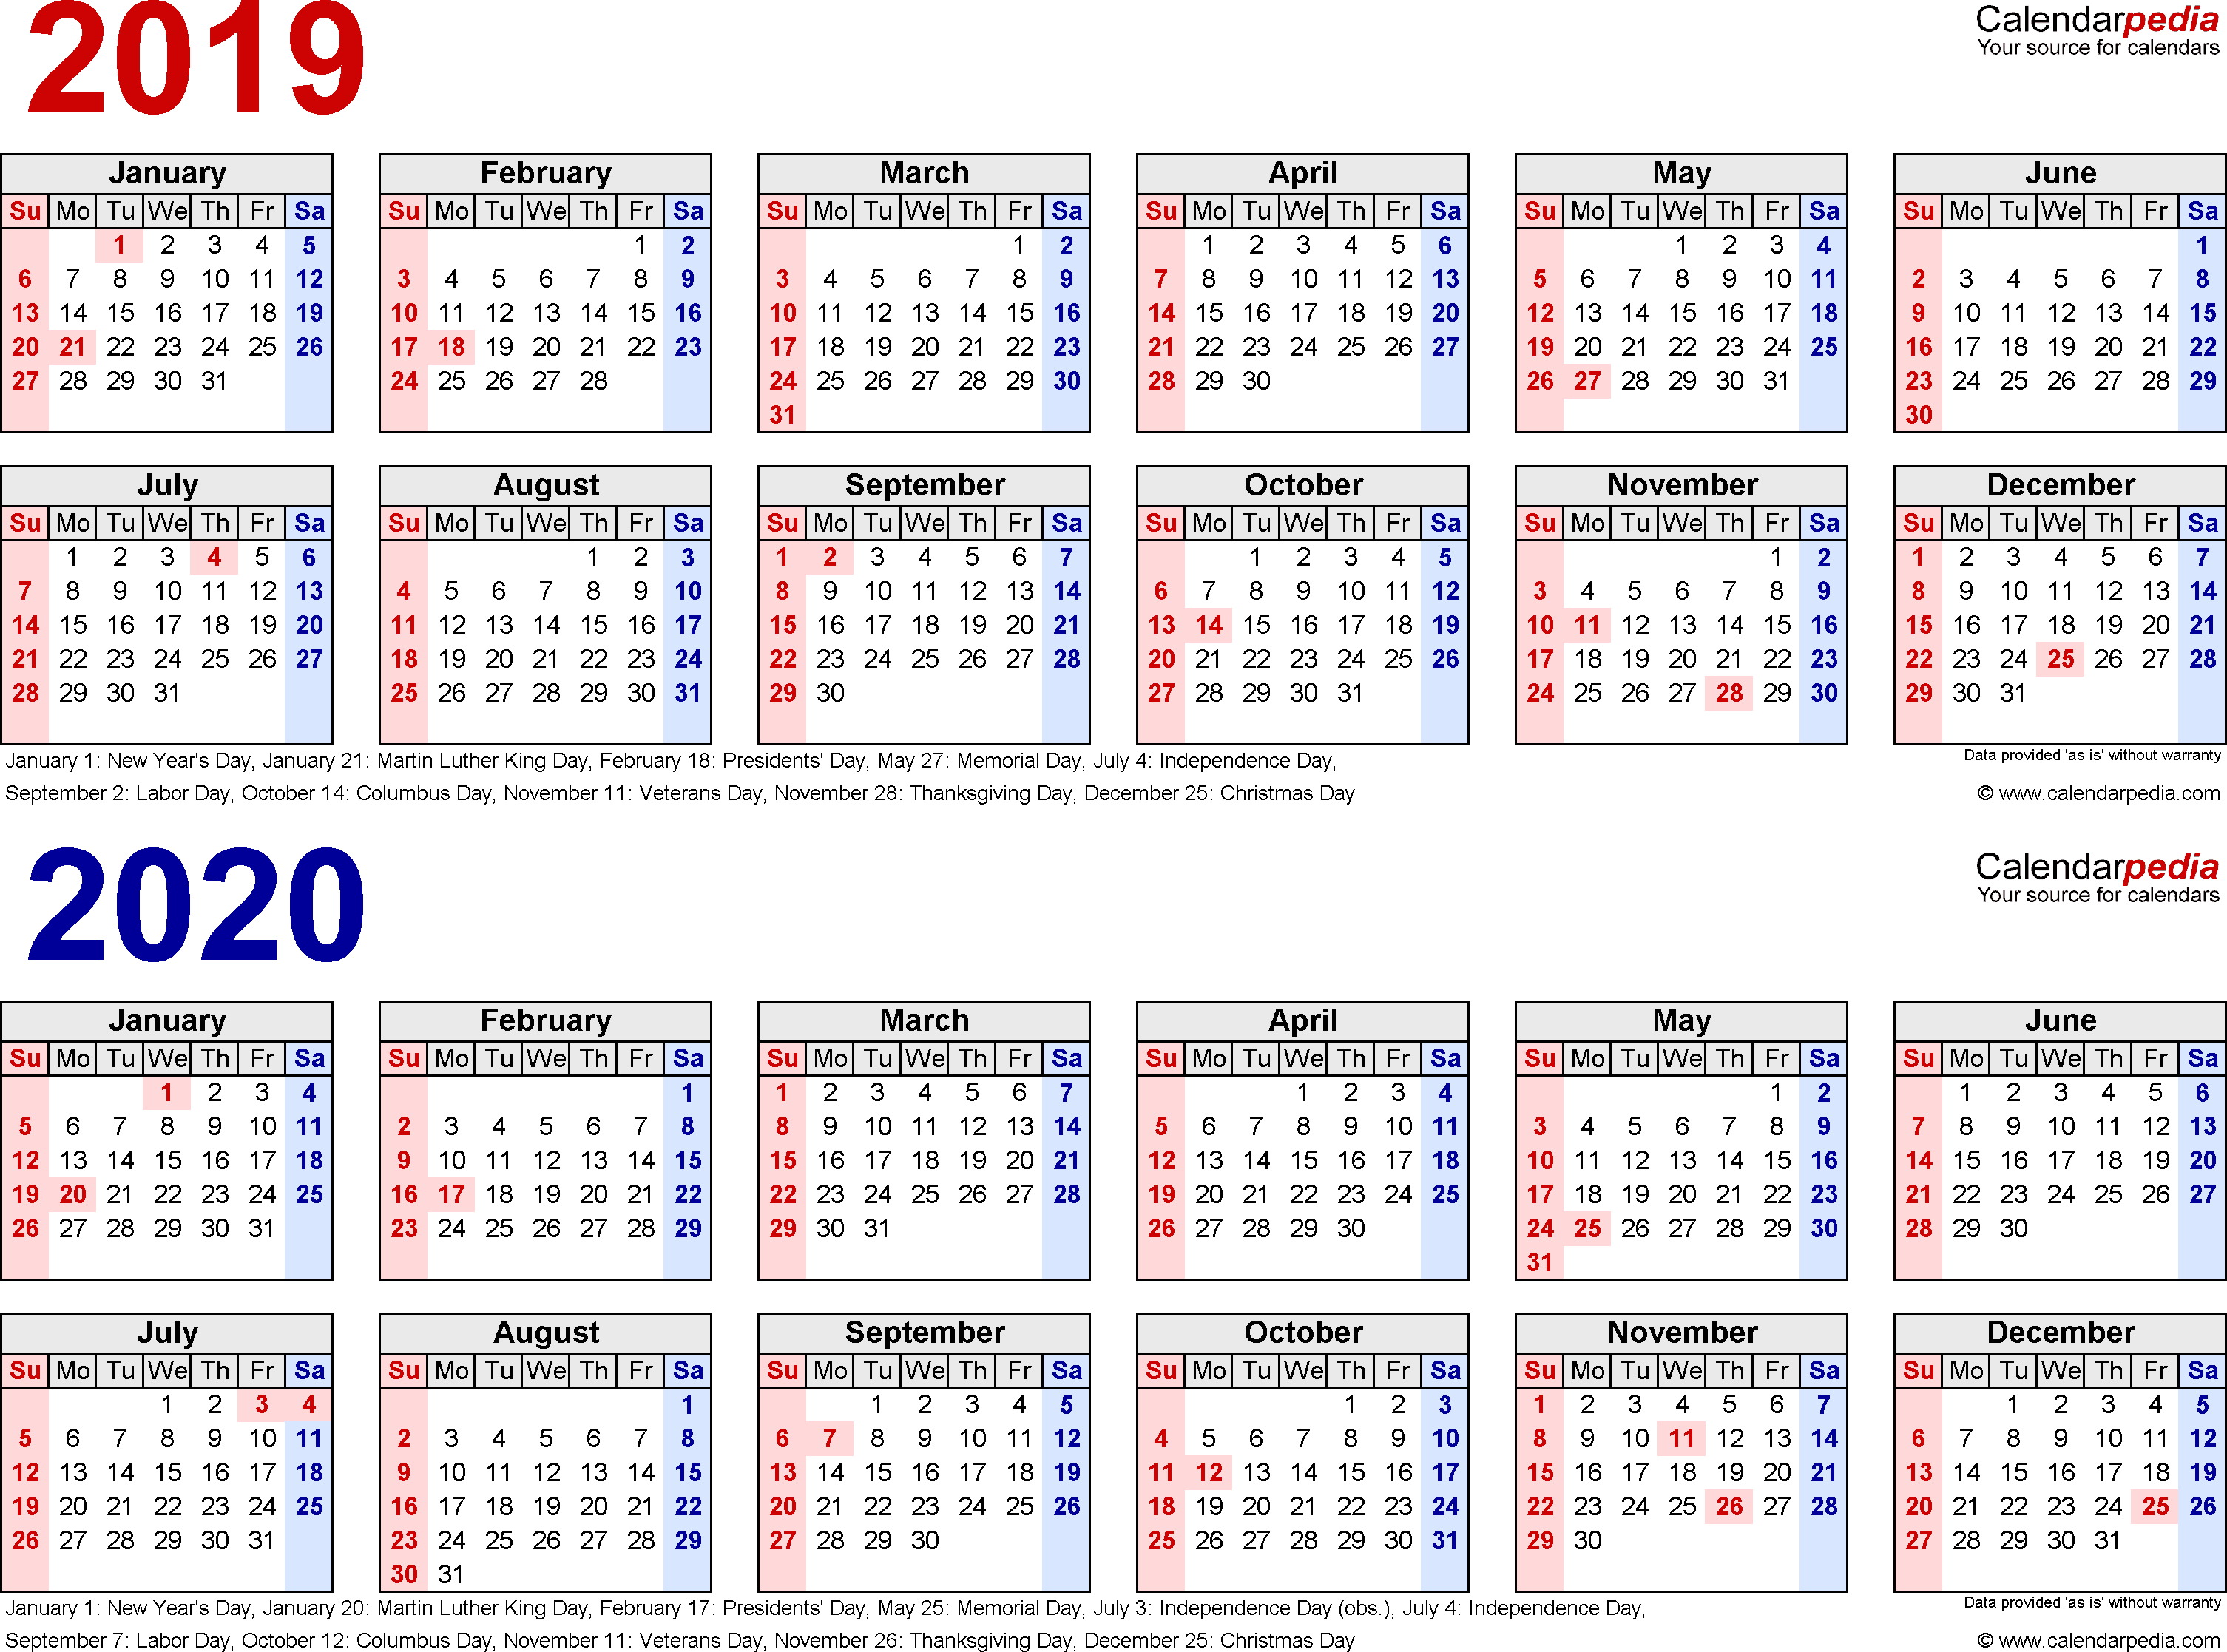 2019-2020 Calendar - Free Printable Two-Year Pdf Calendars with regard to Calendar 2019 2020 Free Download